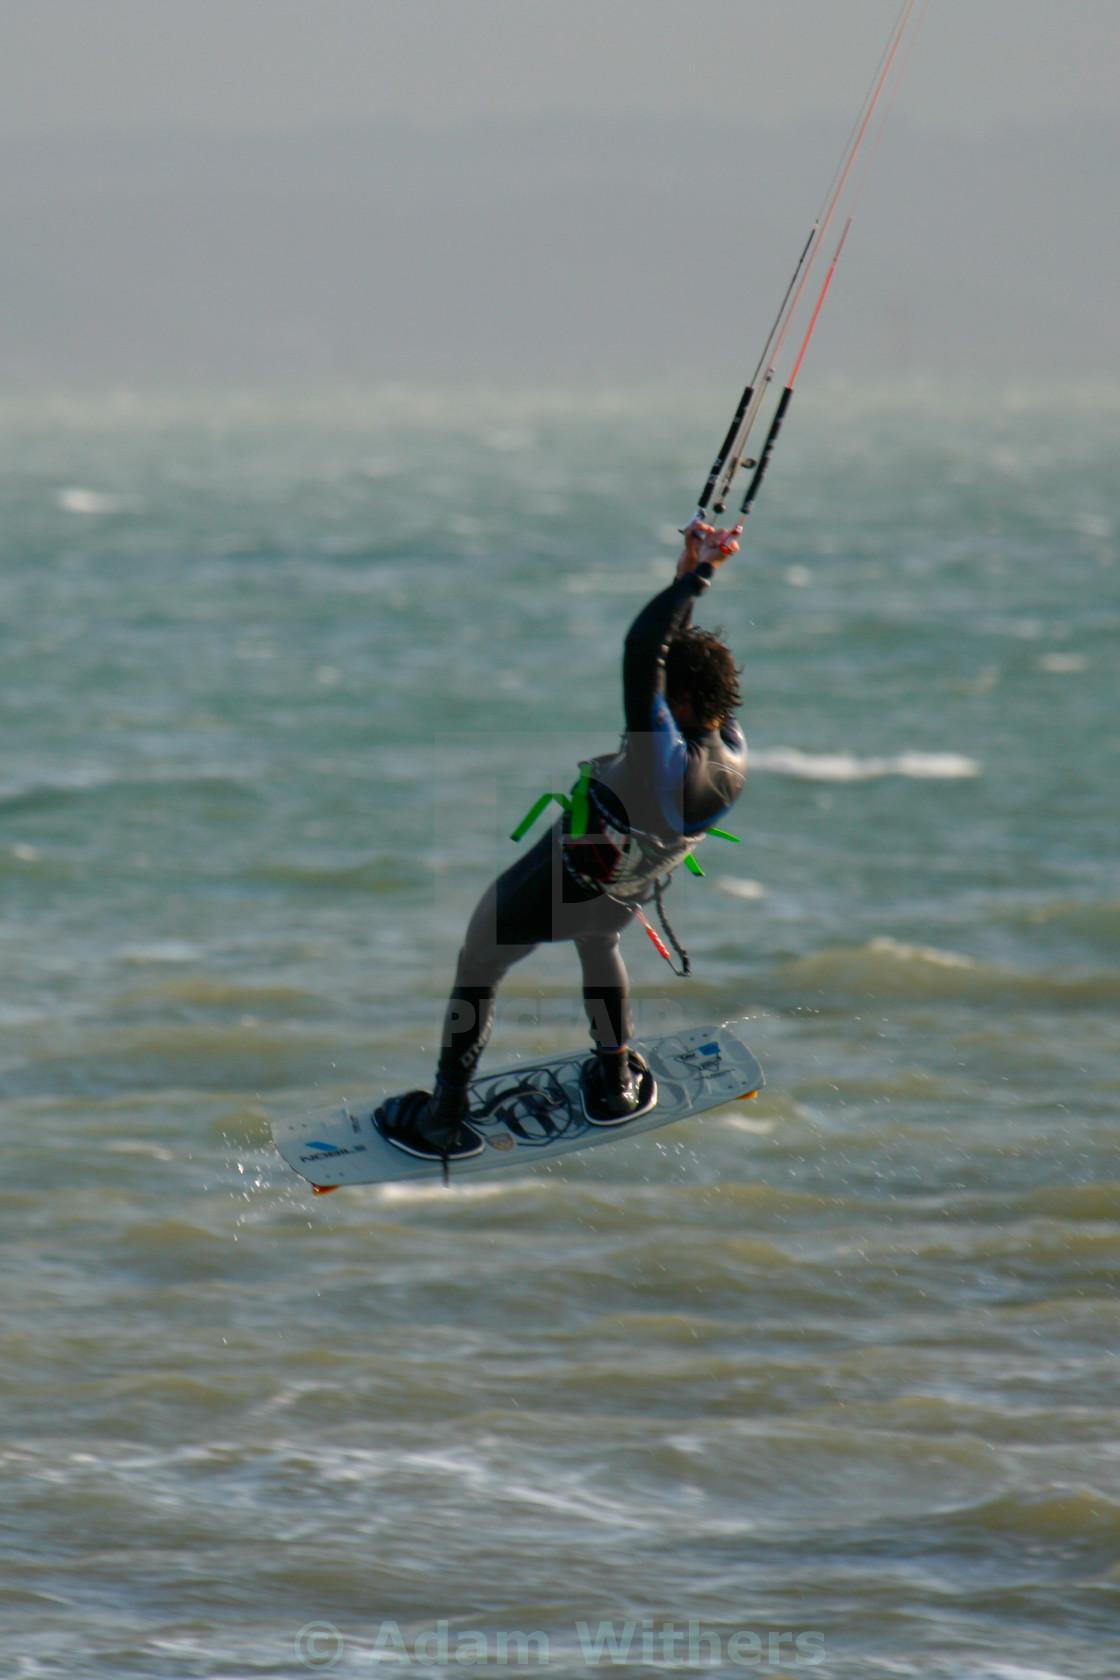 """Kitesurfing Dude getting Air"" stock image"